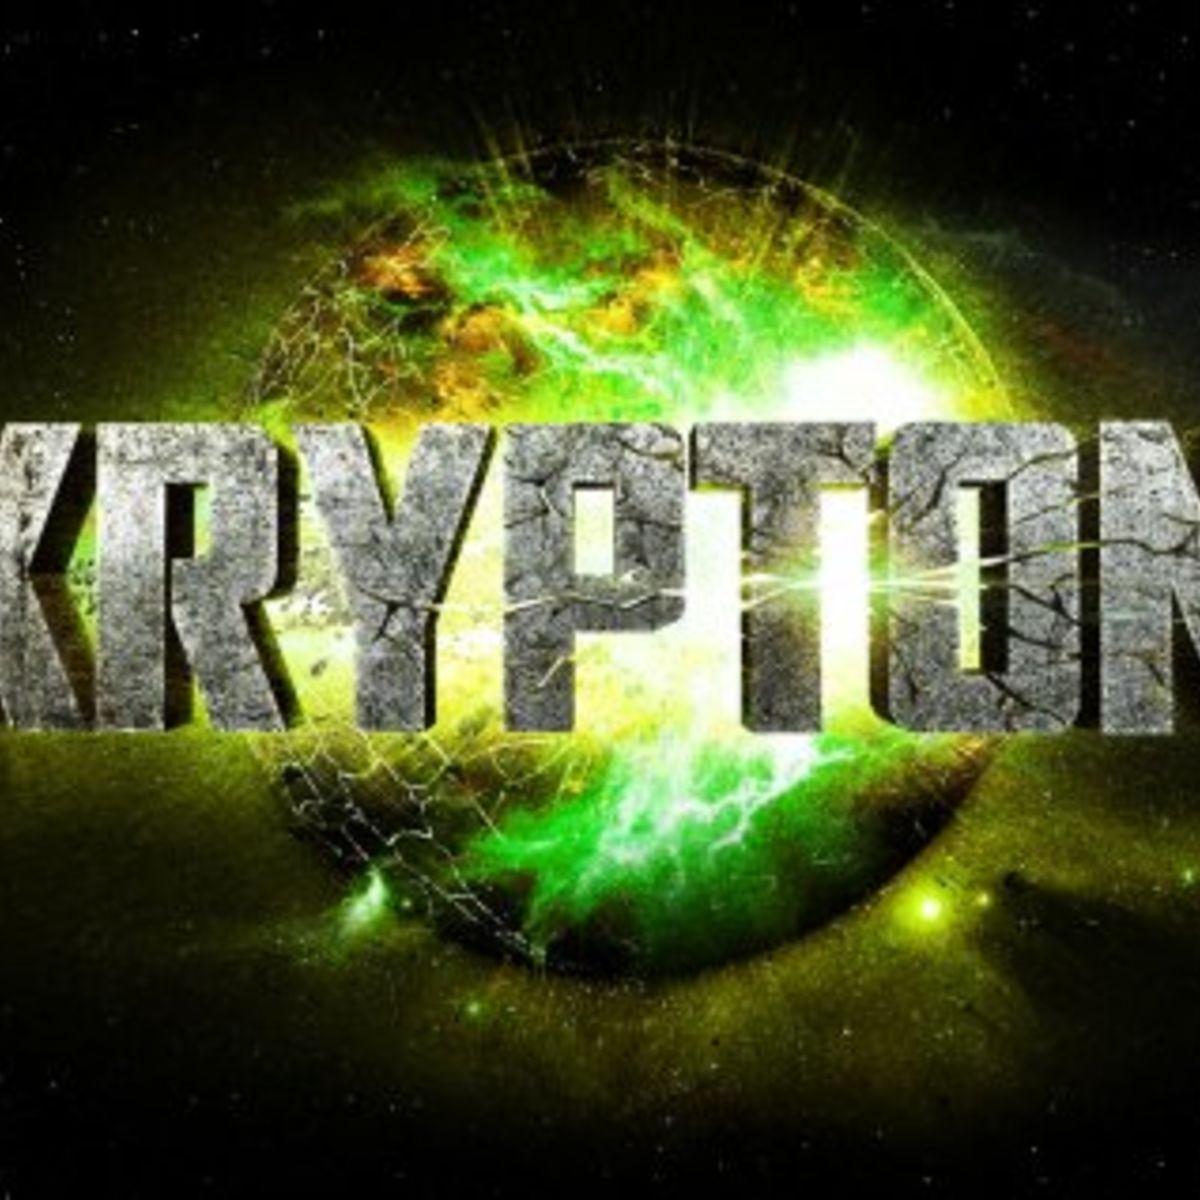 krypton_art.jpg